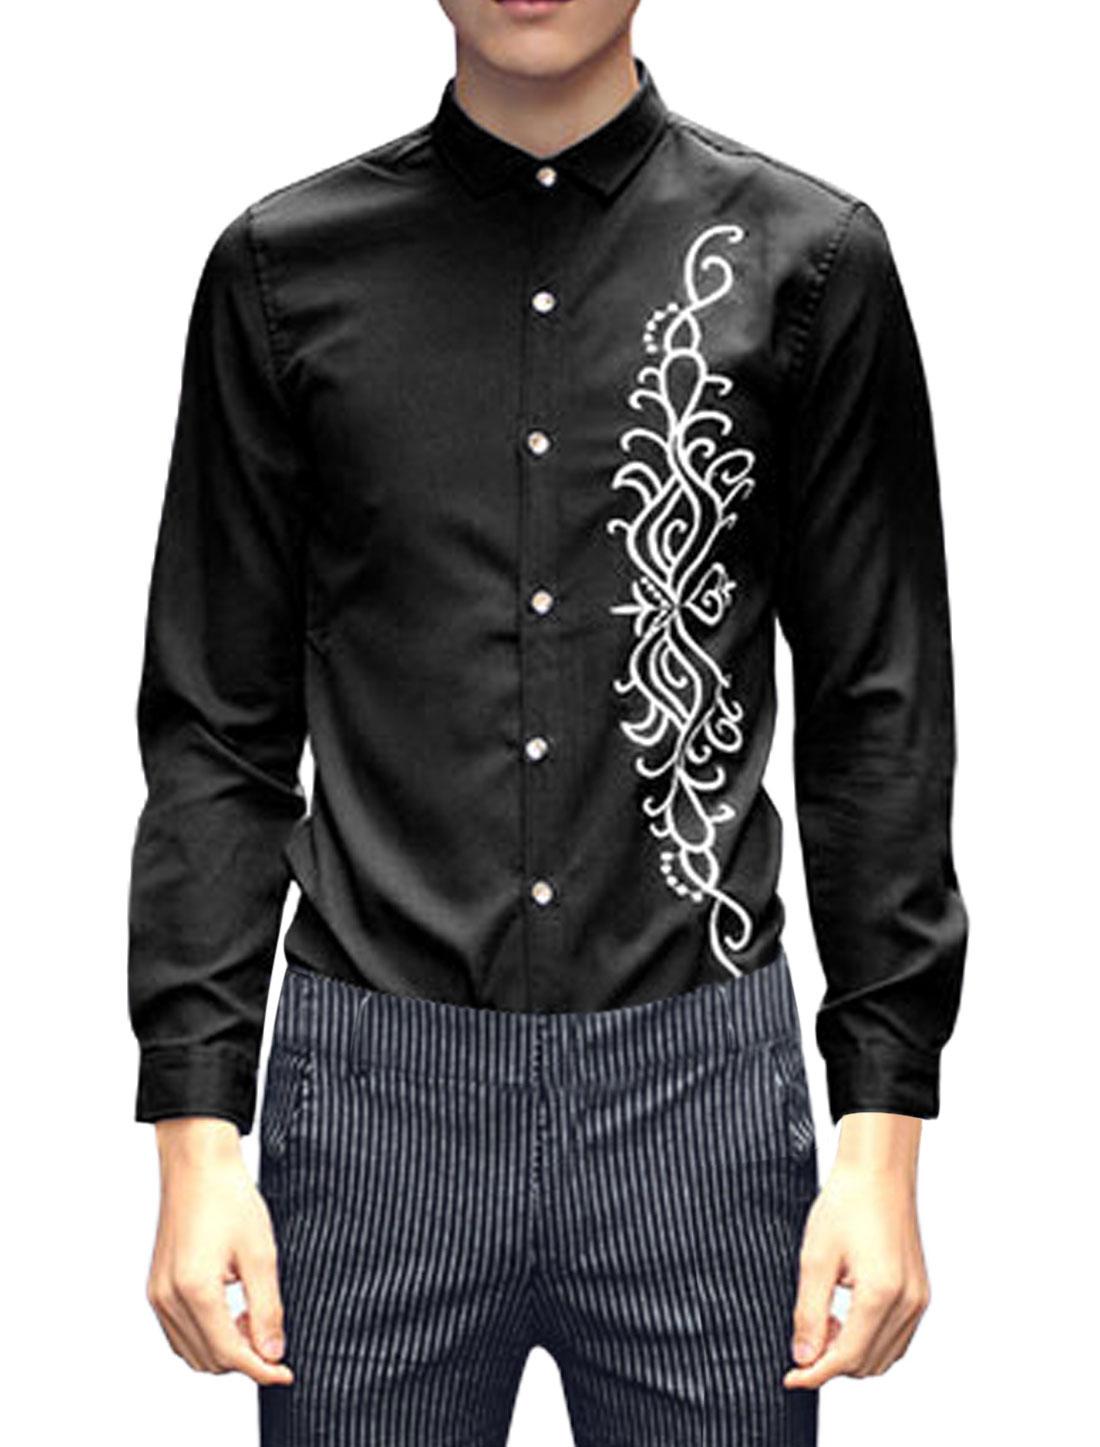 Men Point Collar Long Sleeve Round Hem Chiffon Shirts Black M